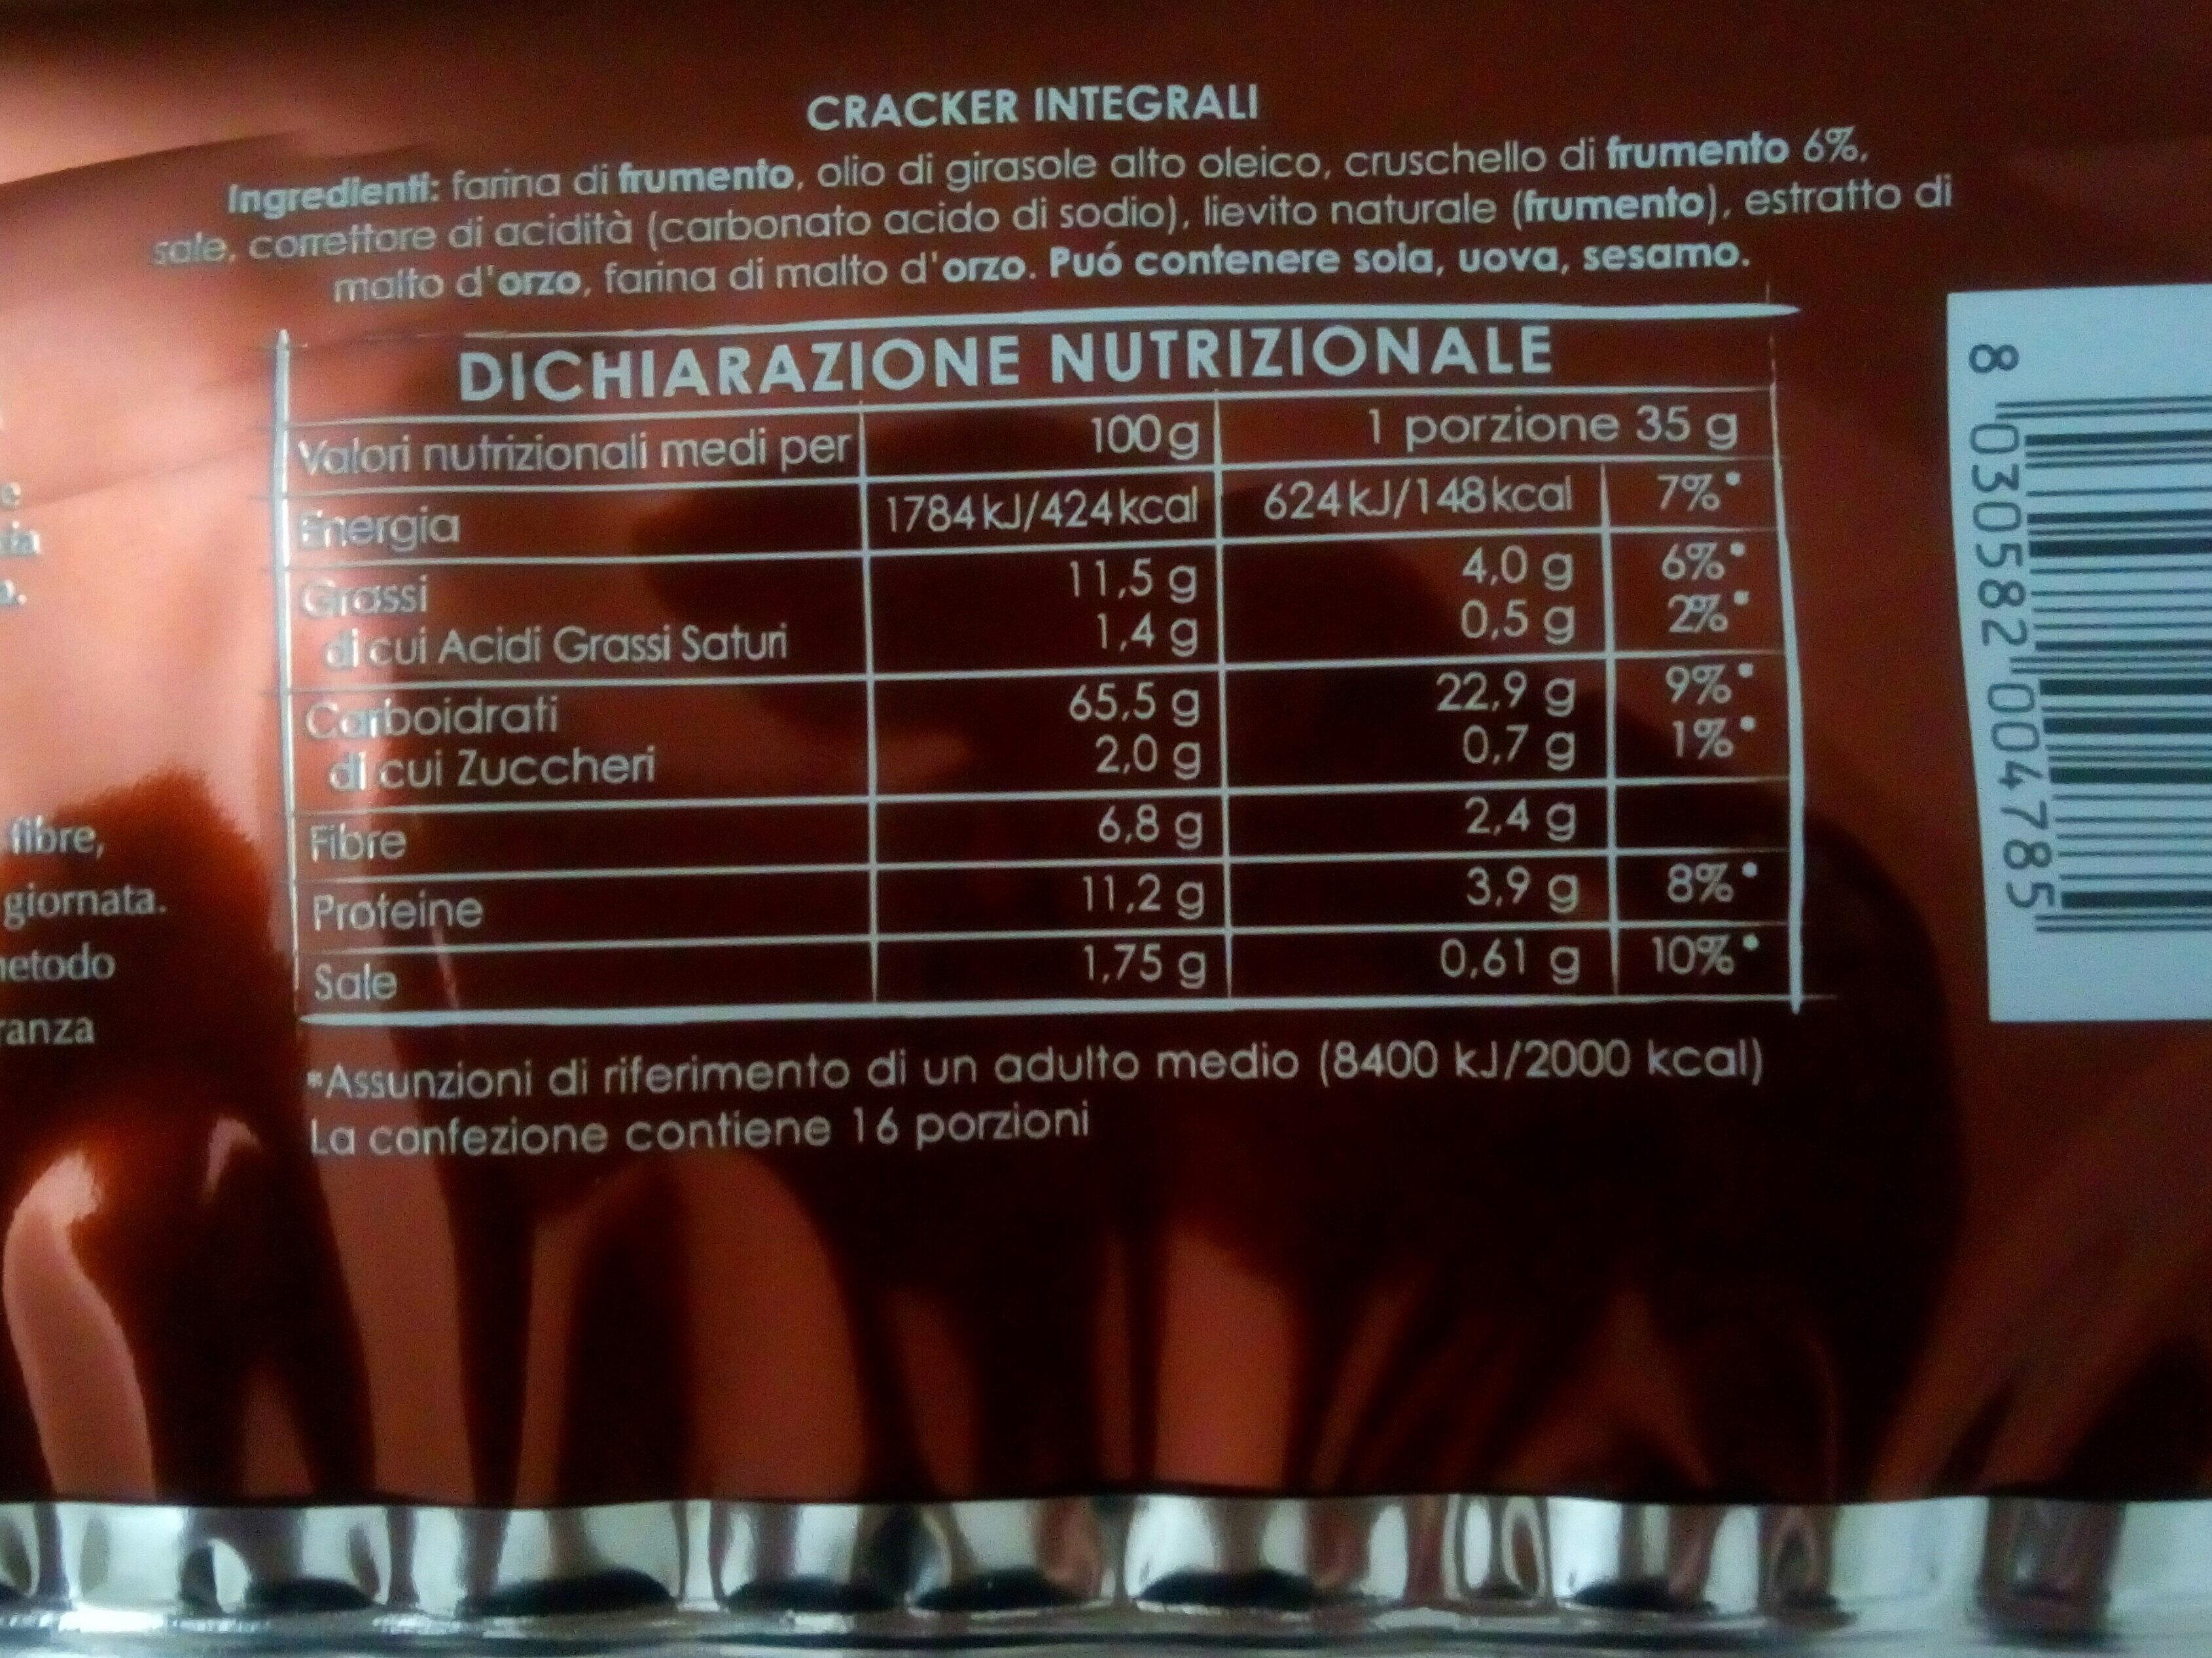 Cracker integrali - Nährwertangaben - it